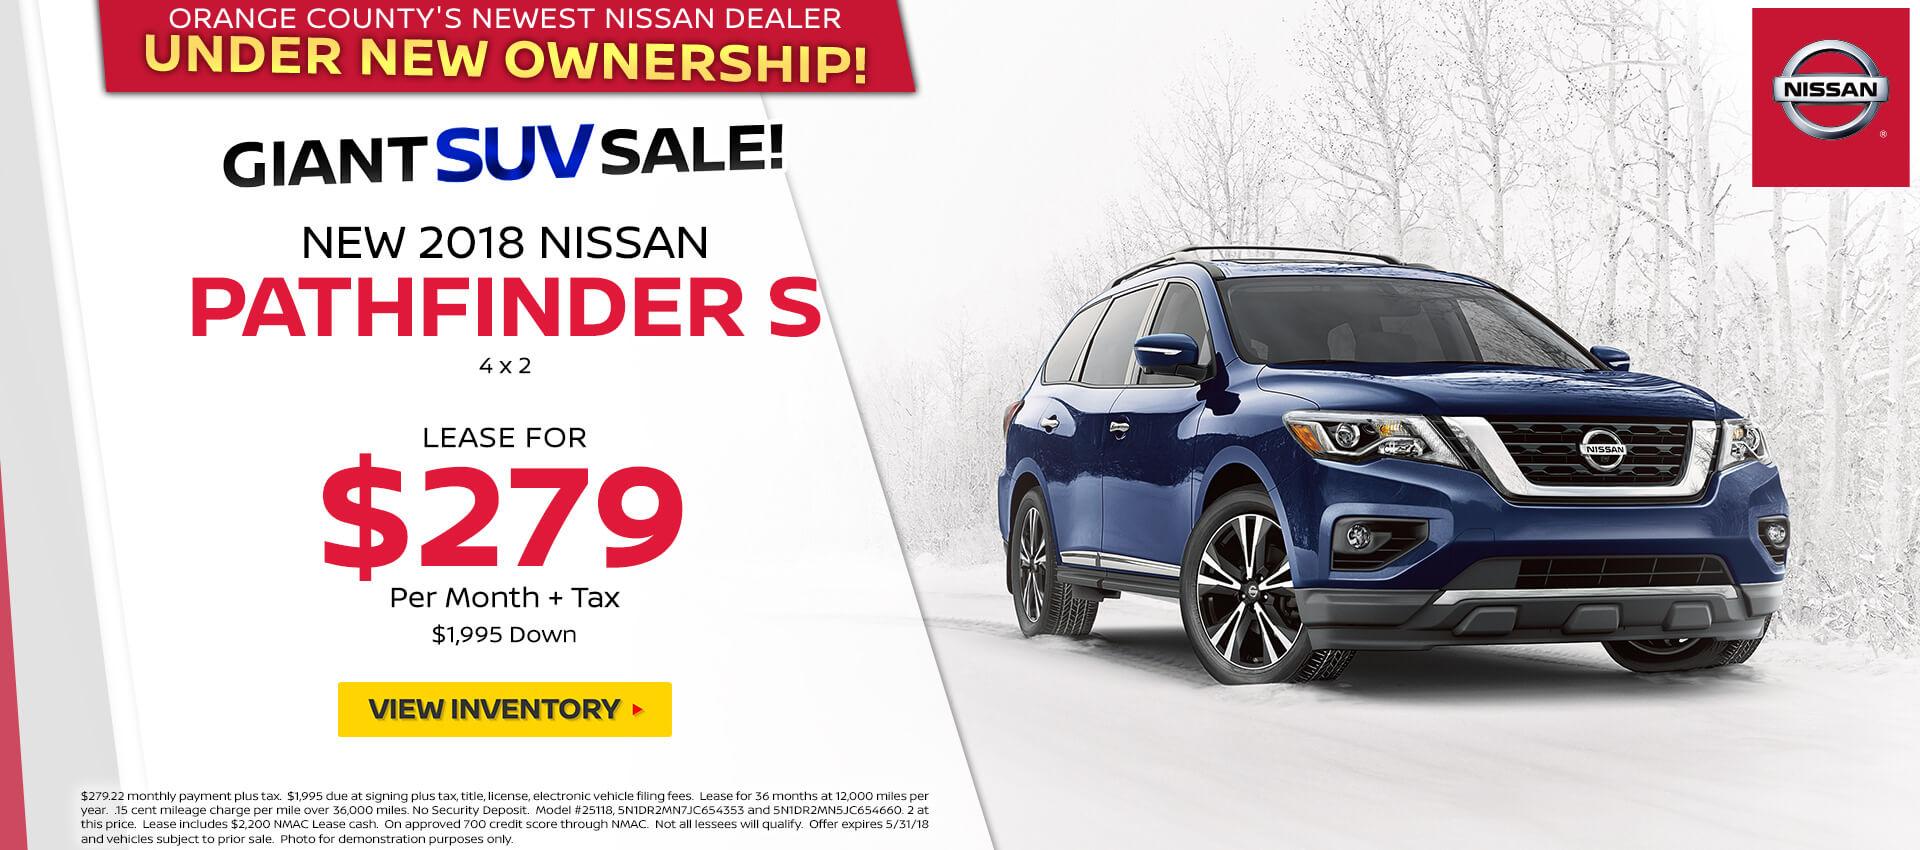 2018 Nissan Pathfinder $279 Lease